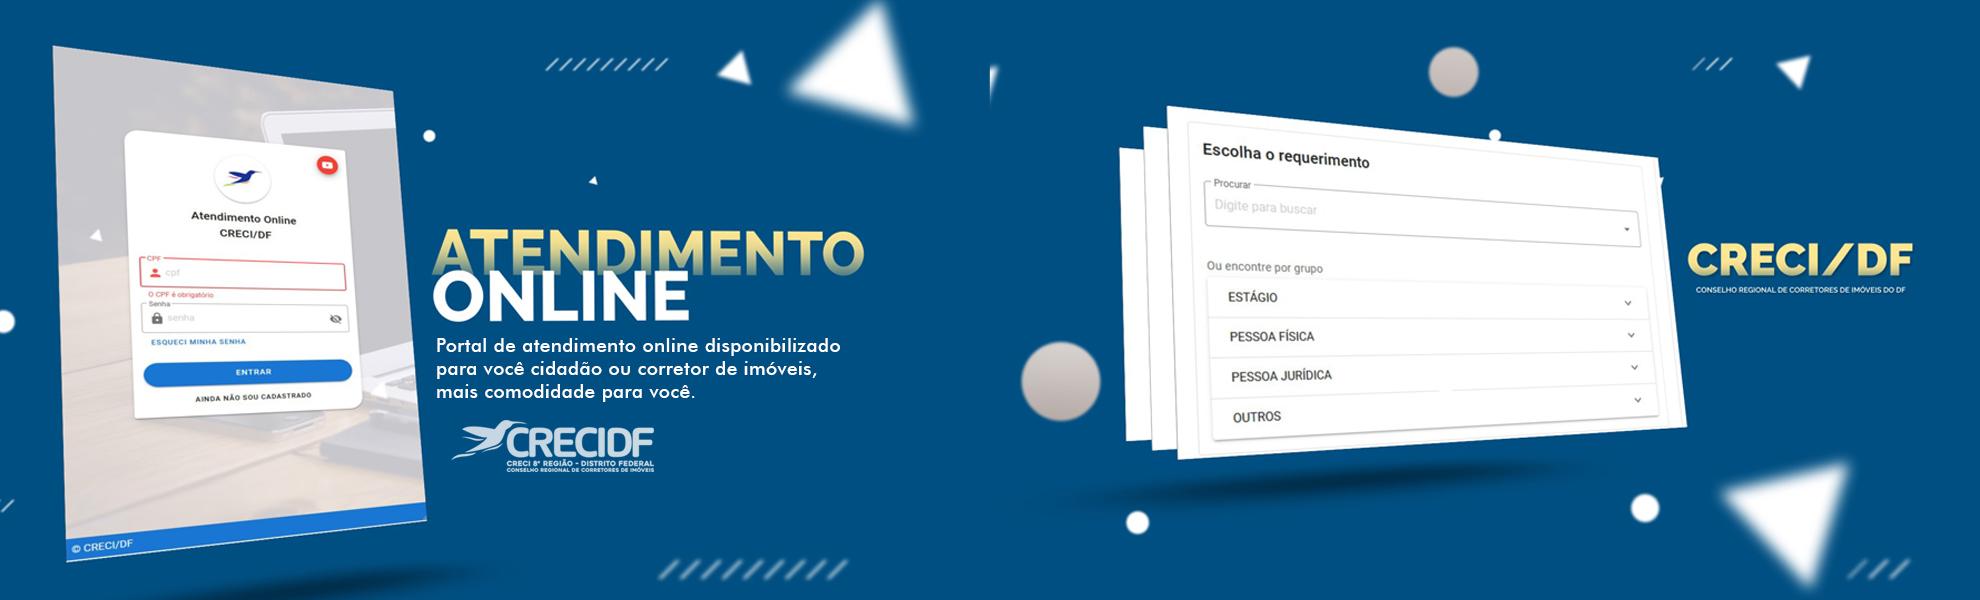 Plataforma de atendimento online CRECI-DF